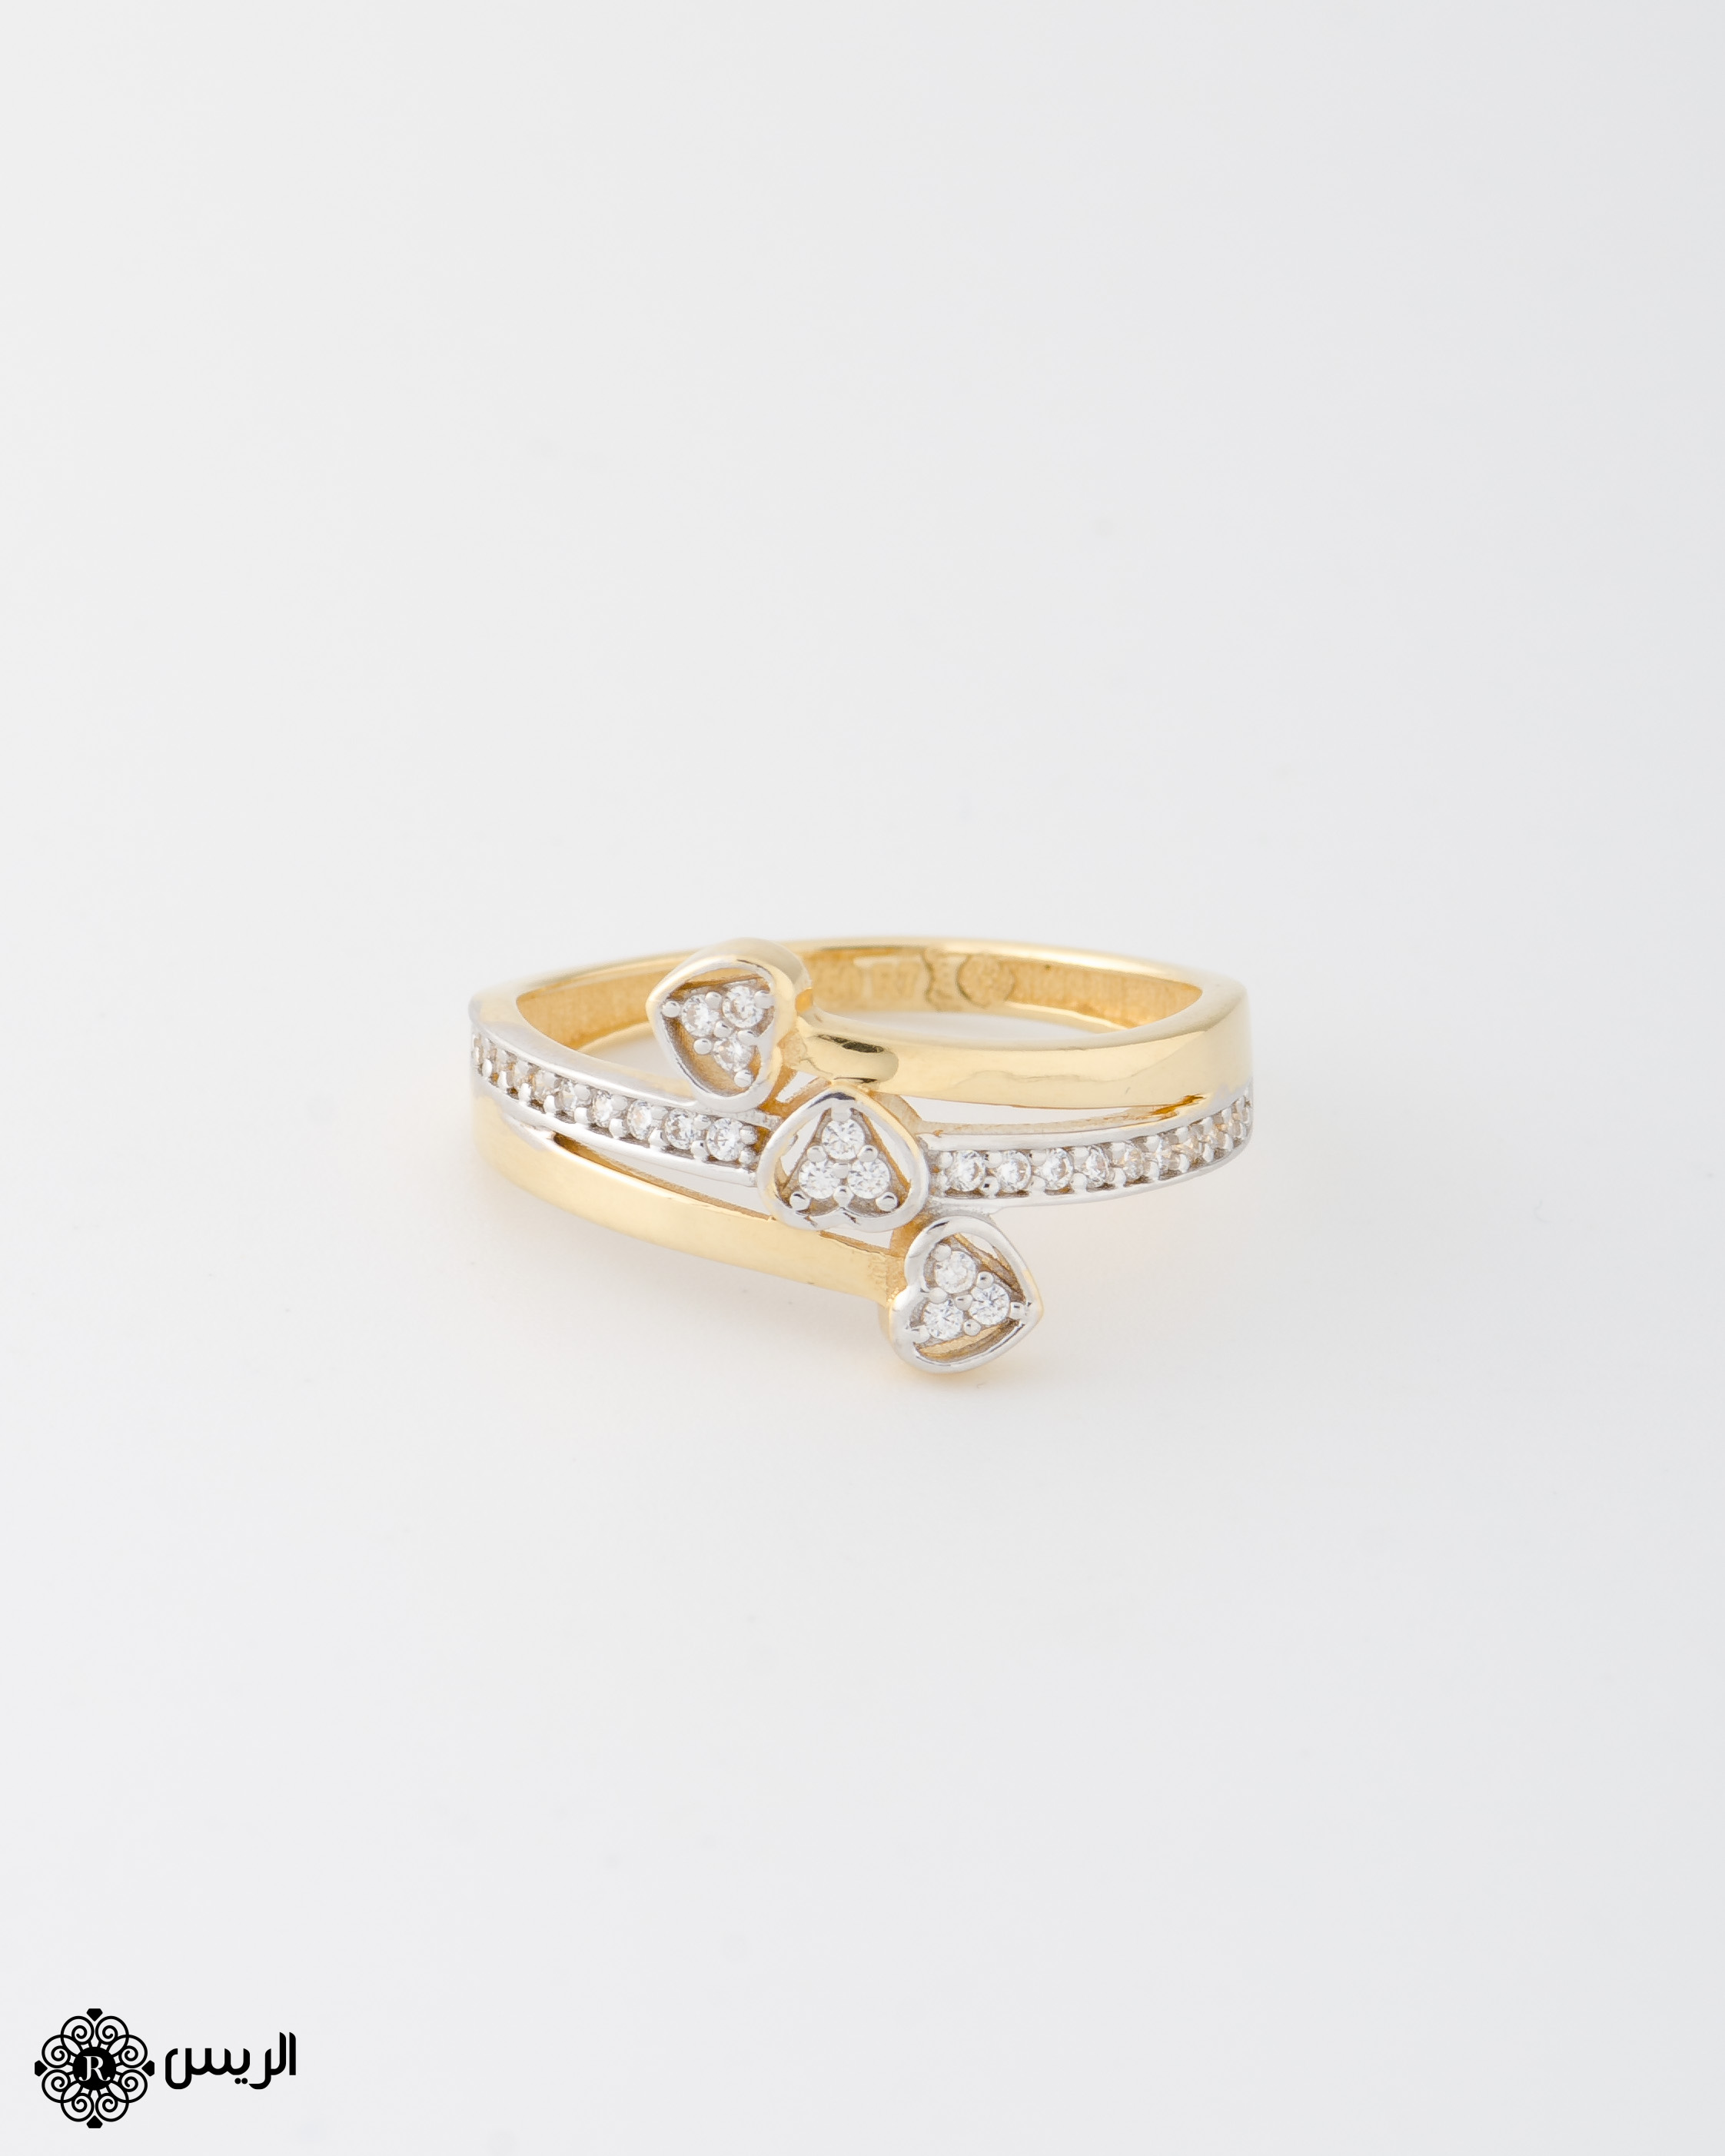 Raies jewelry Delicate Hearts Ring خاتم ناعم قلوب الريس للمجوهرات